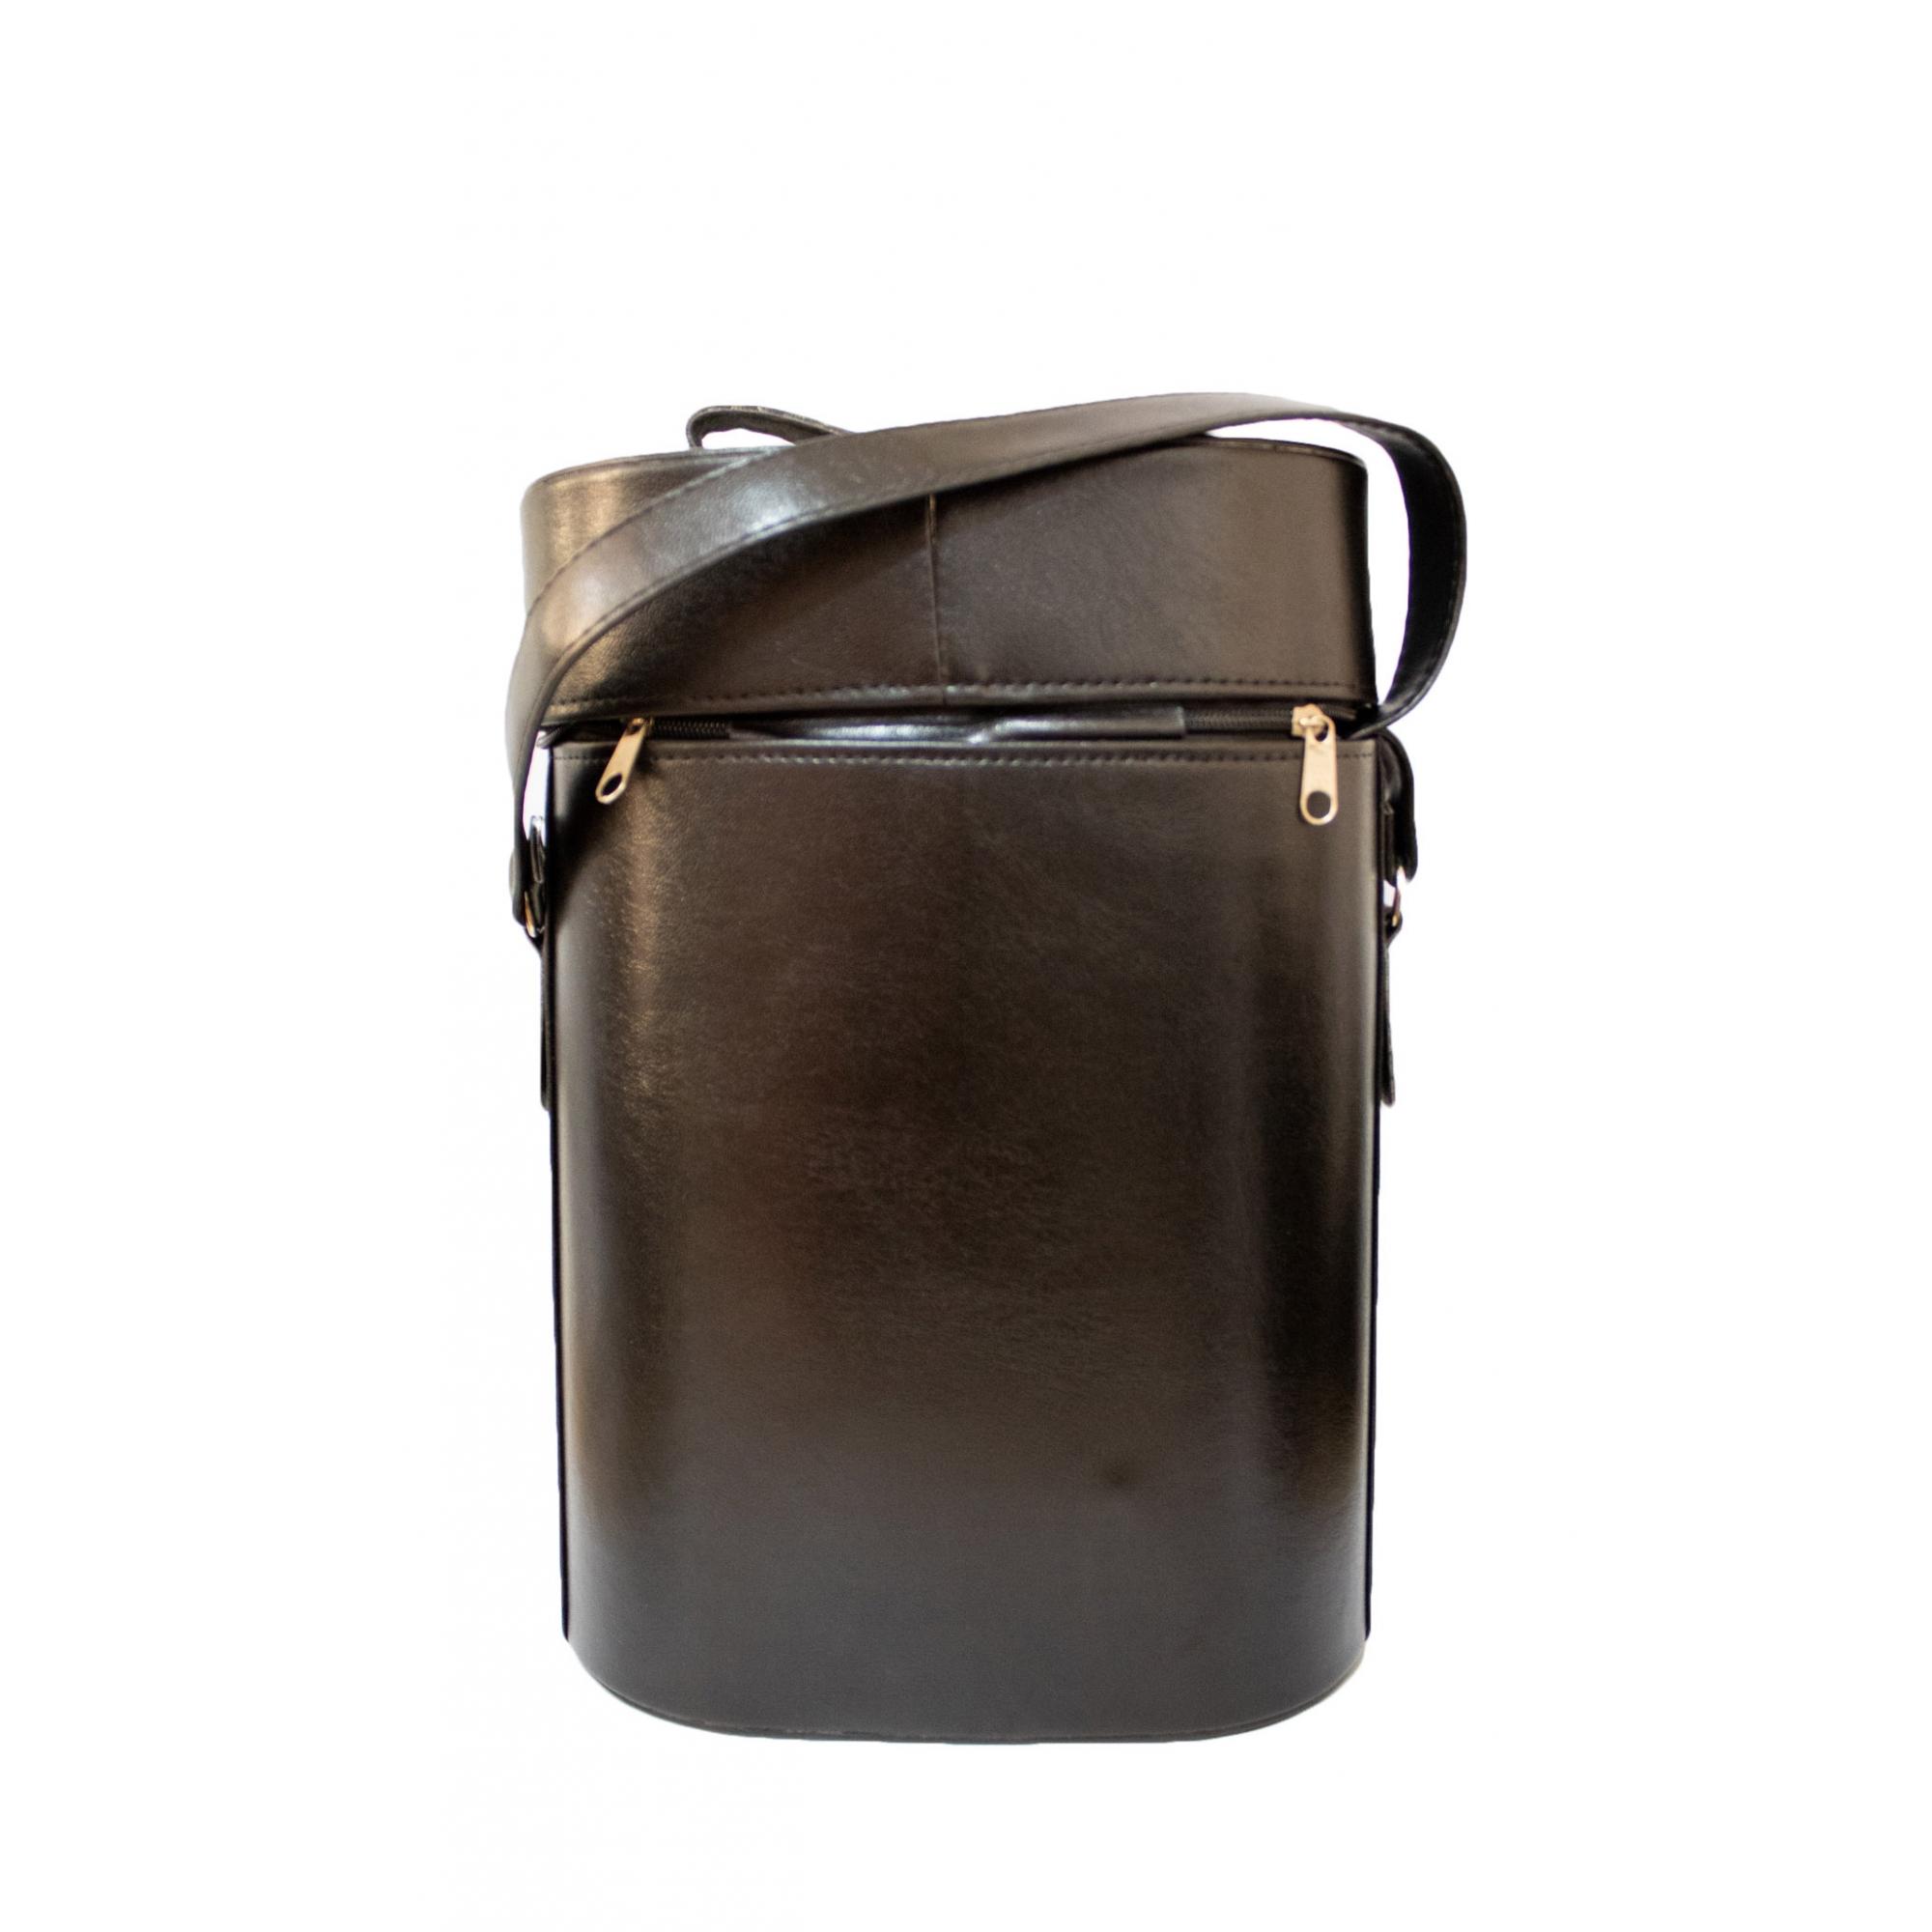 Conjunto chimarrão mateira 1 litro, térmica, cuia, bomba inox e porta erva